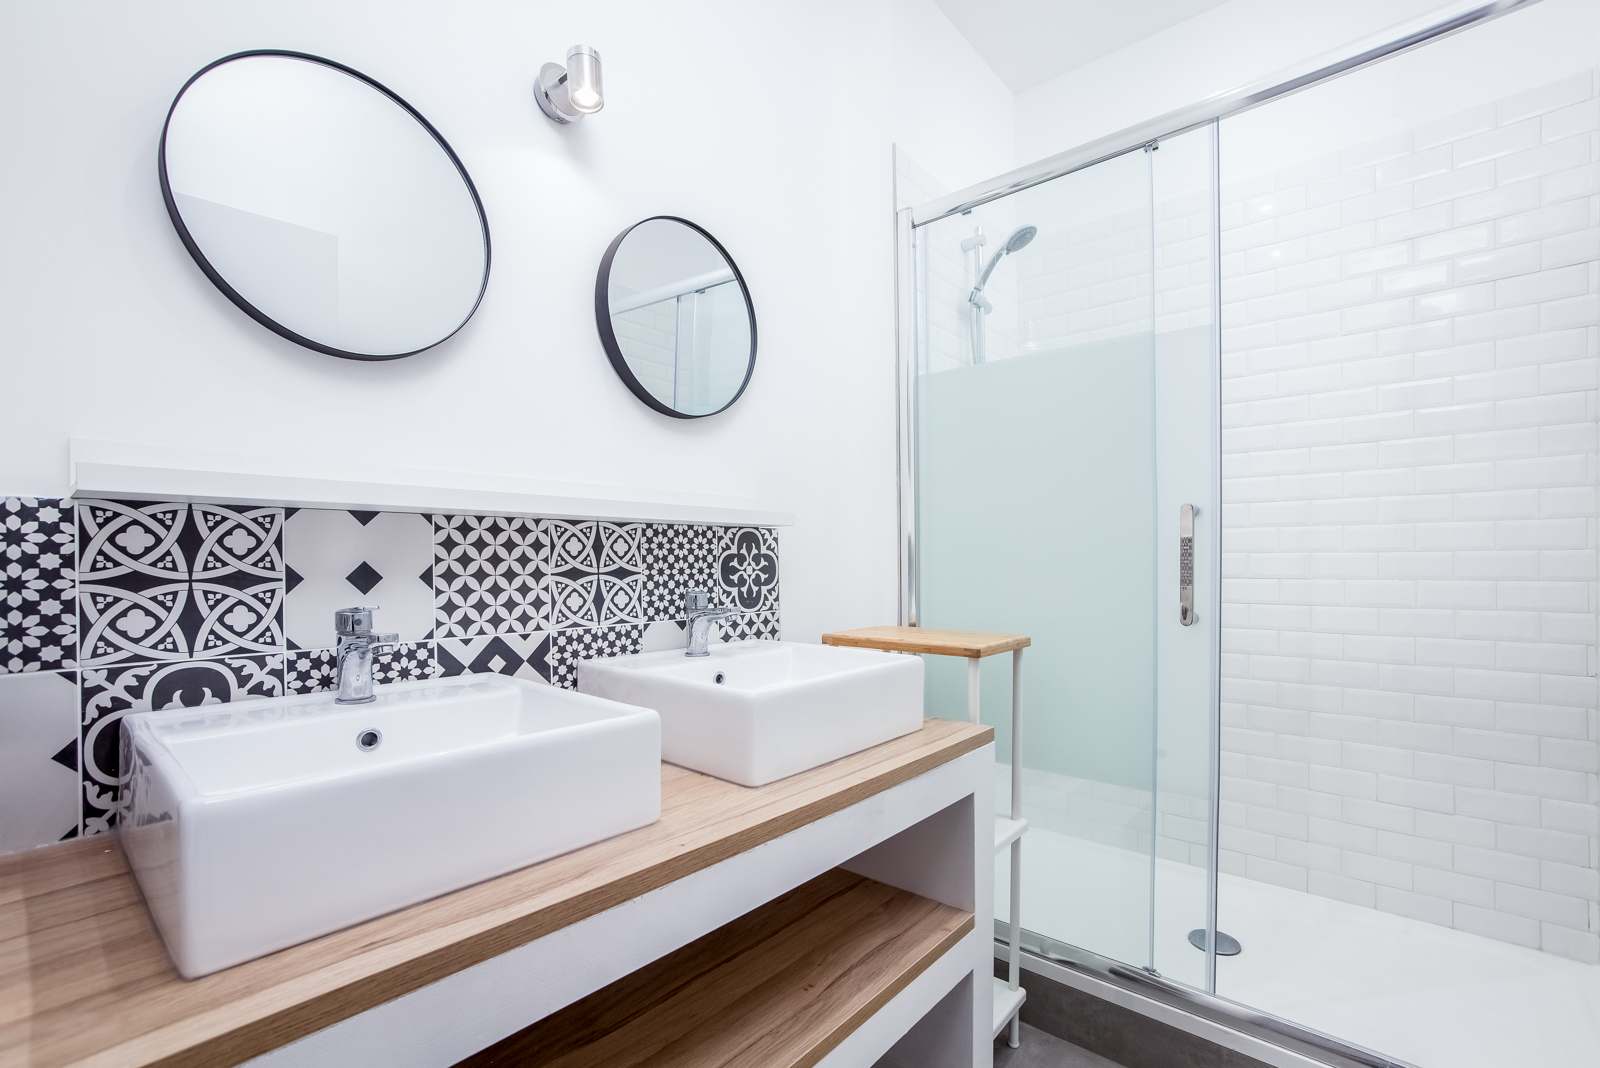 Novaclem - Salle de bain Coloc Labadie - Investissement Marseille